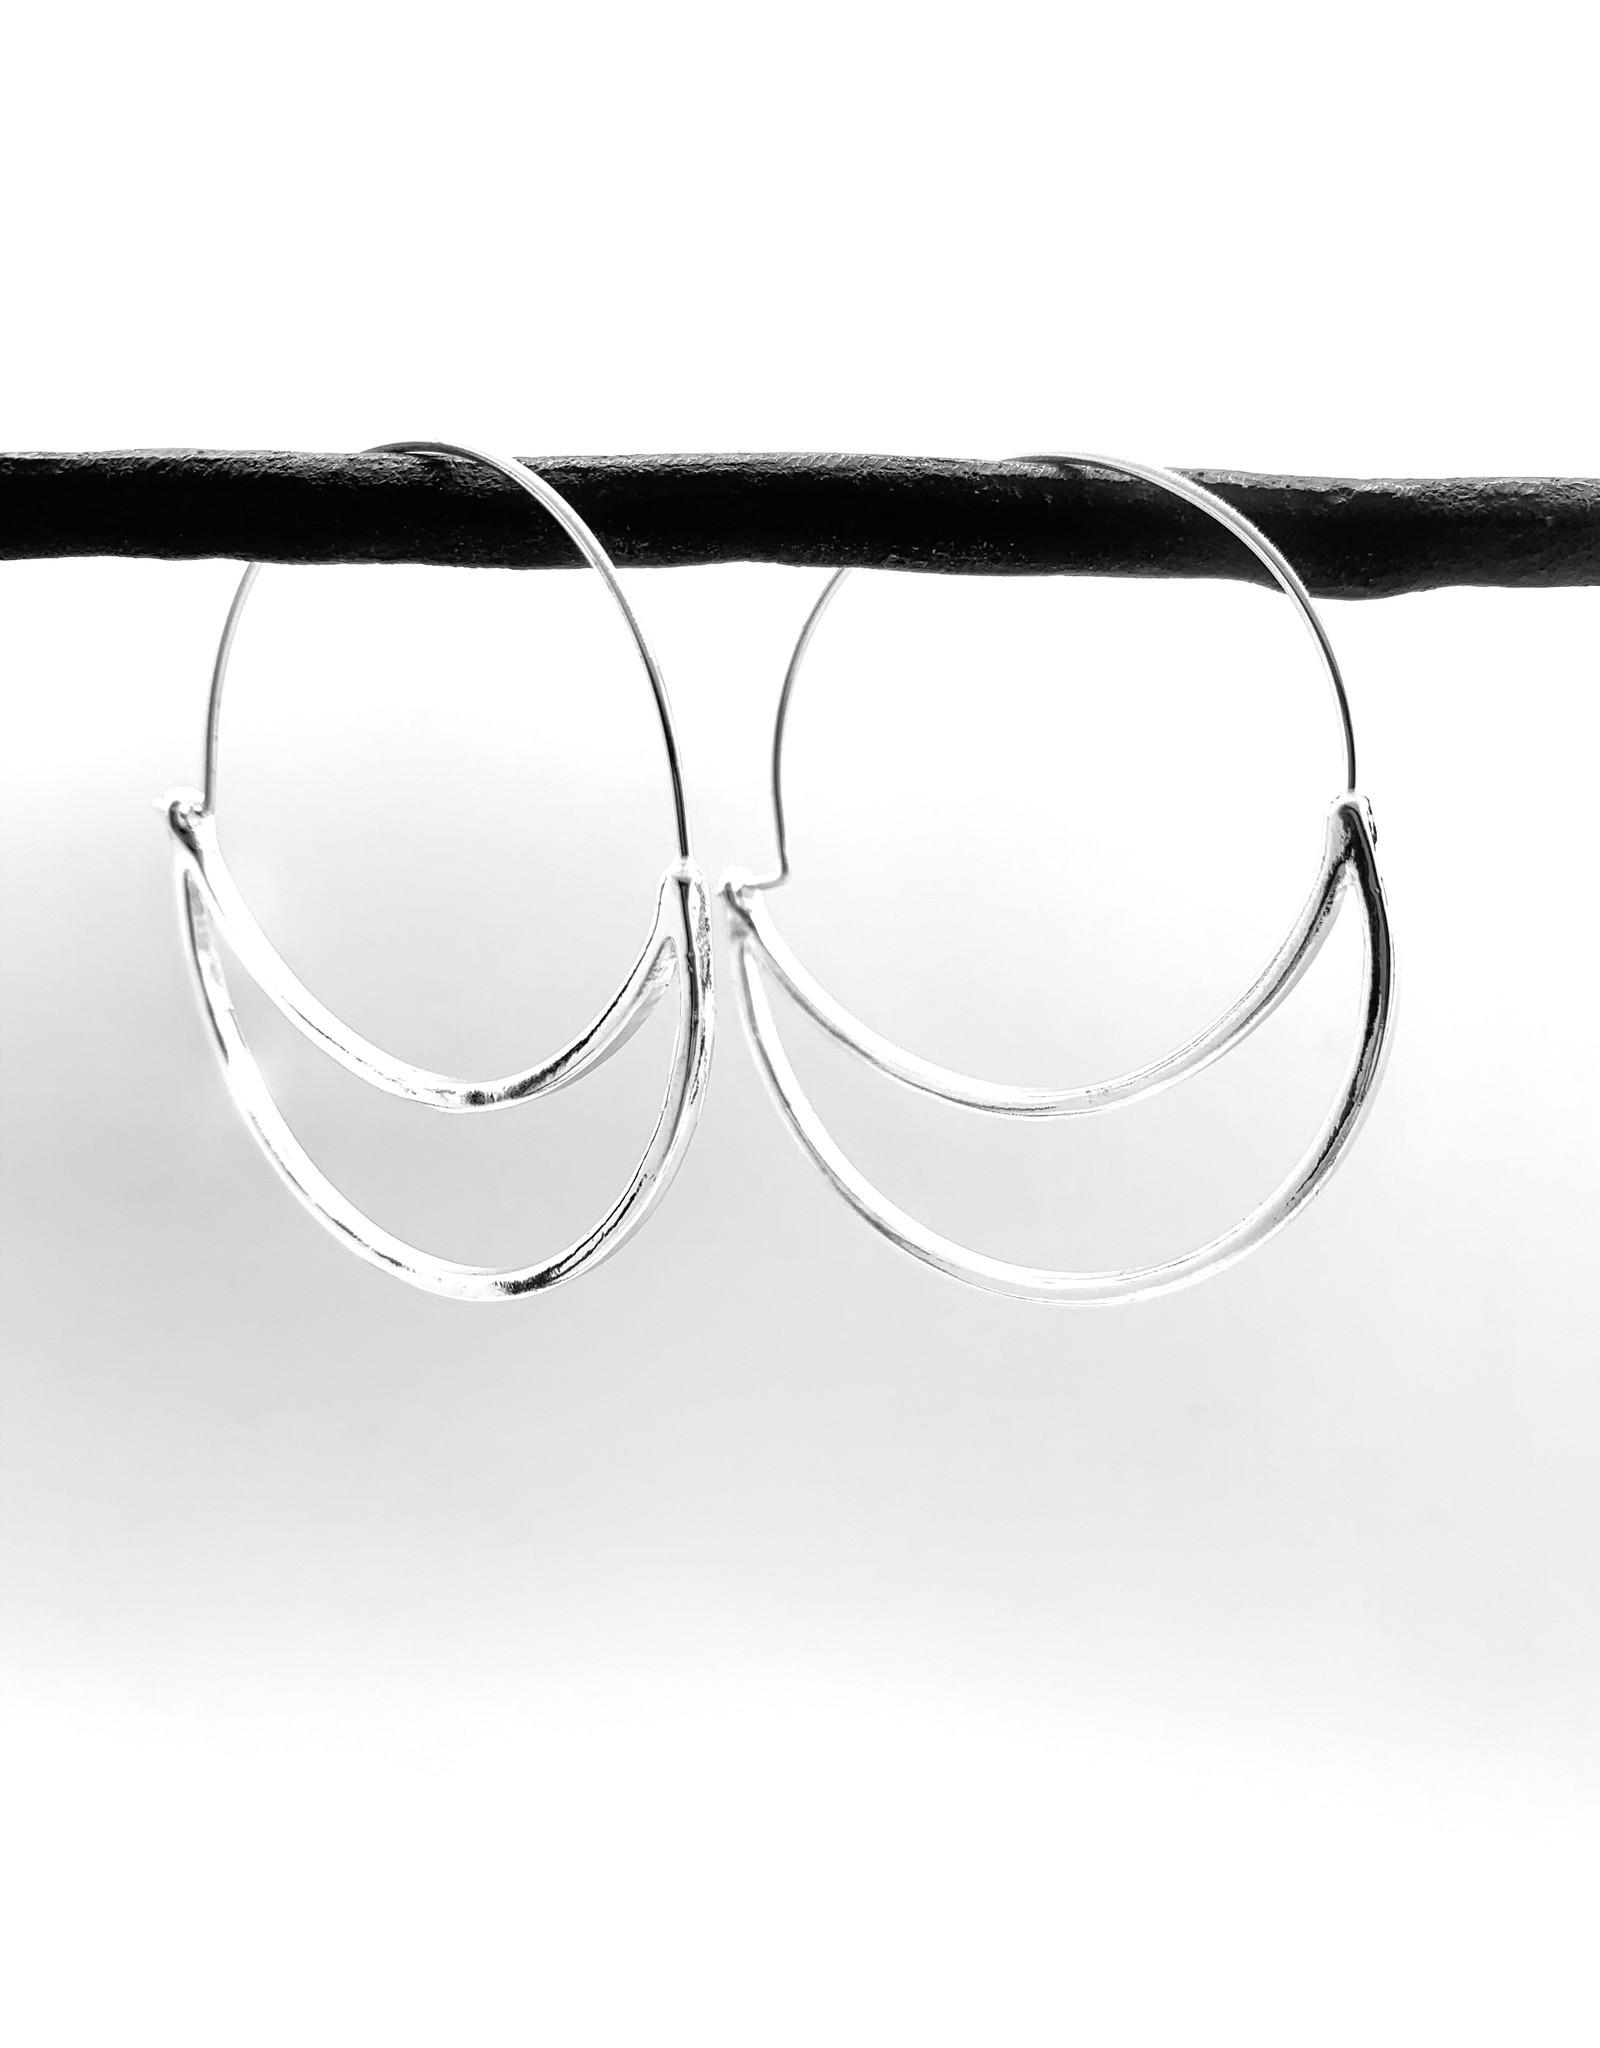 Silver Crescent Hoop Earring